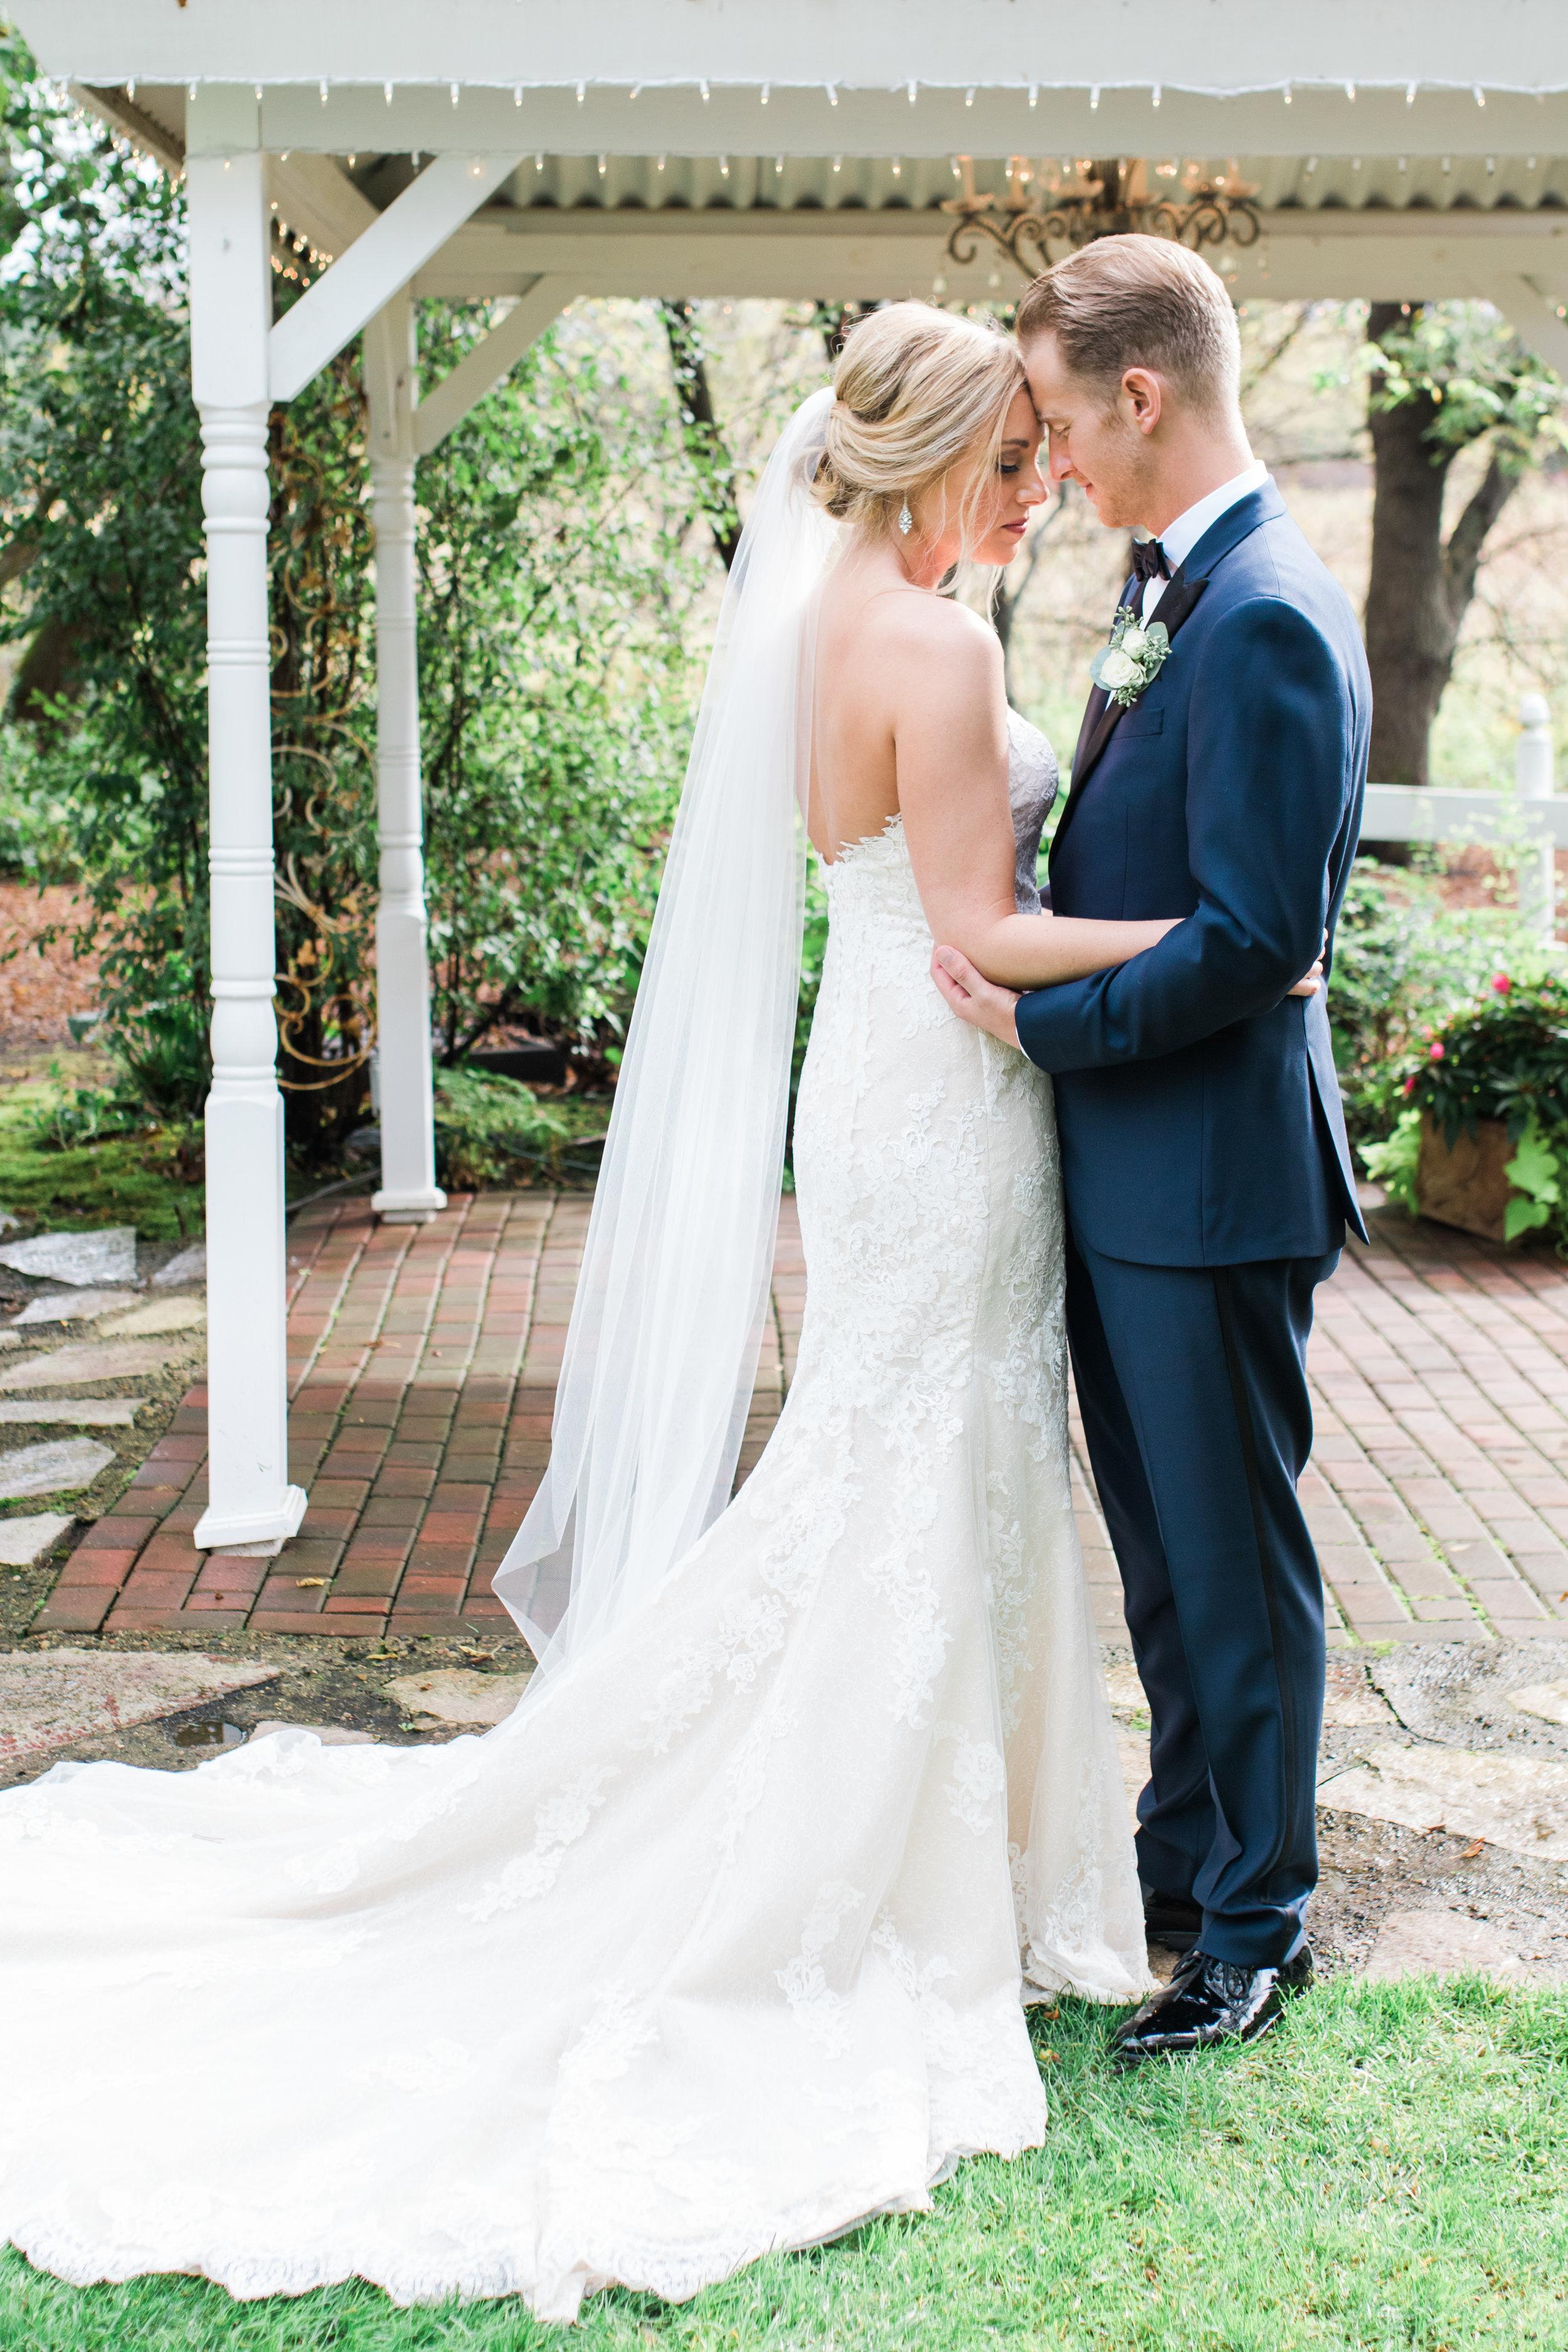 Brett & Sonja - Sabrina Reis Photography - Minenapolis-20.jpg